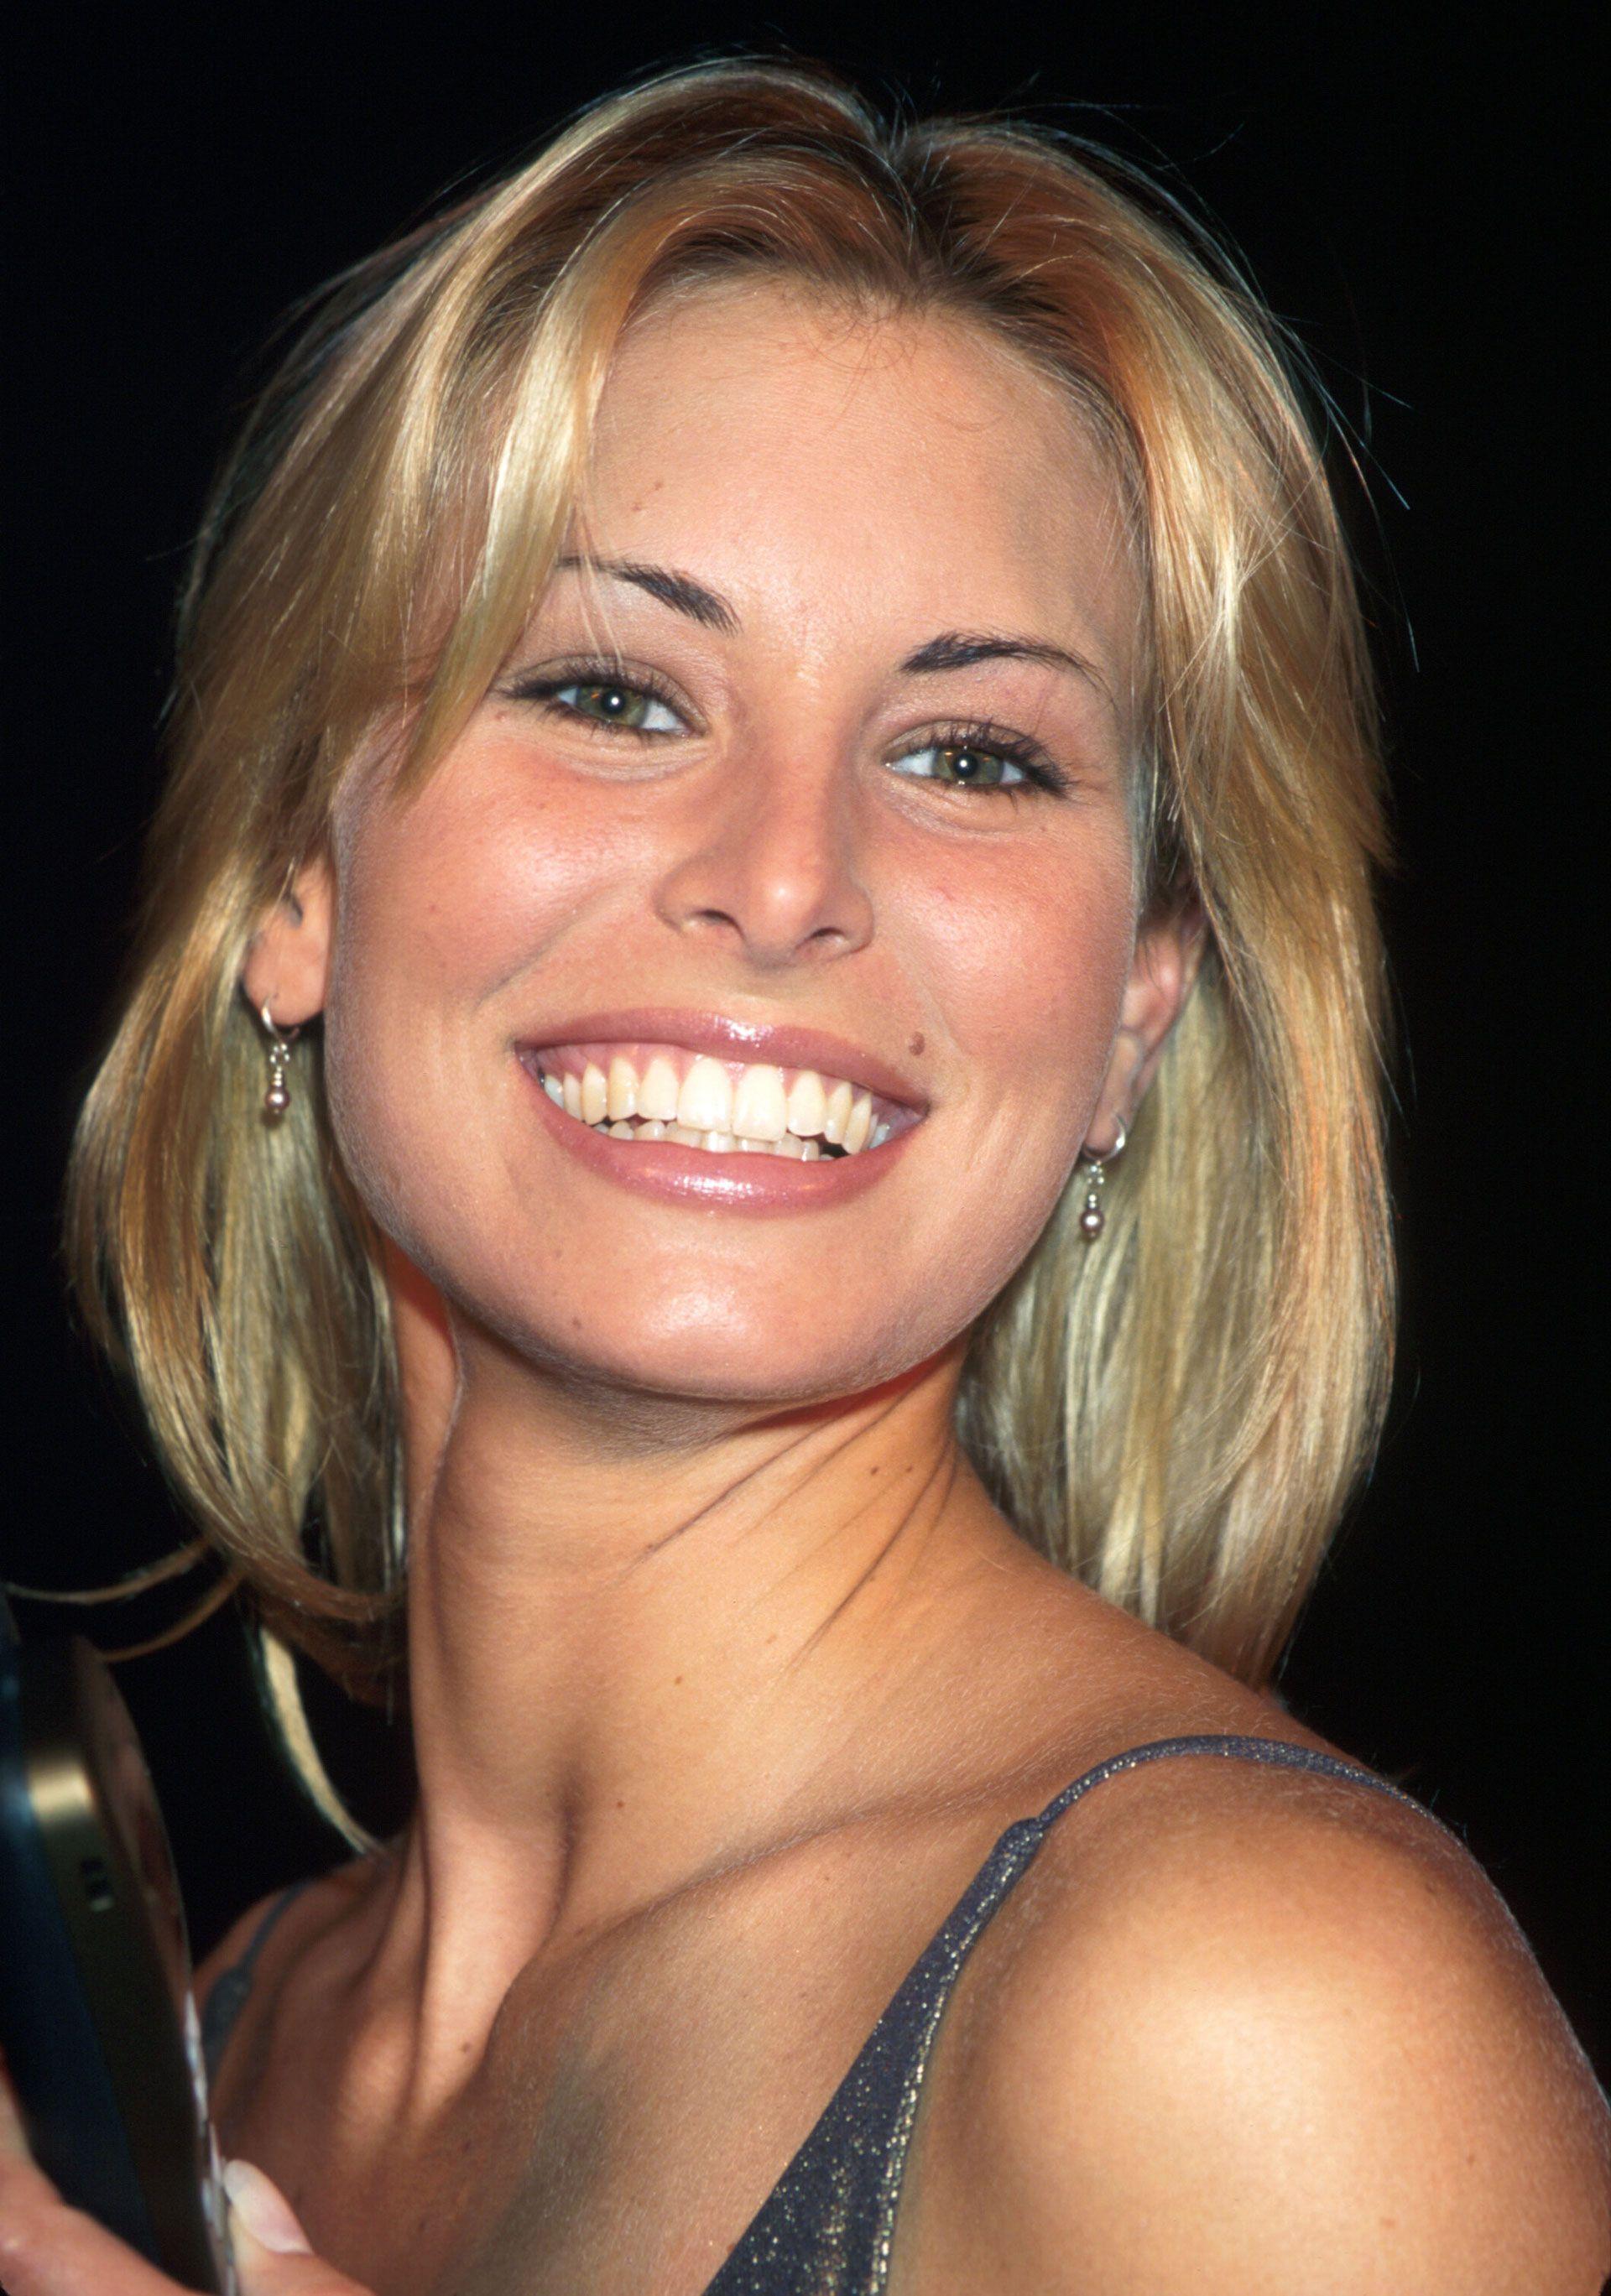 90s Hairstyles Wed Still Wear Today Best Celebrity Hairstyles